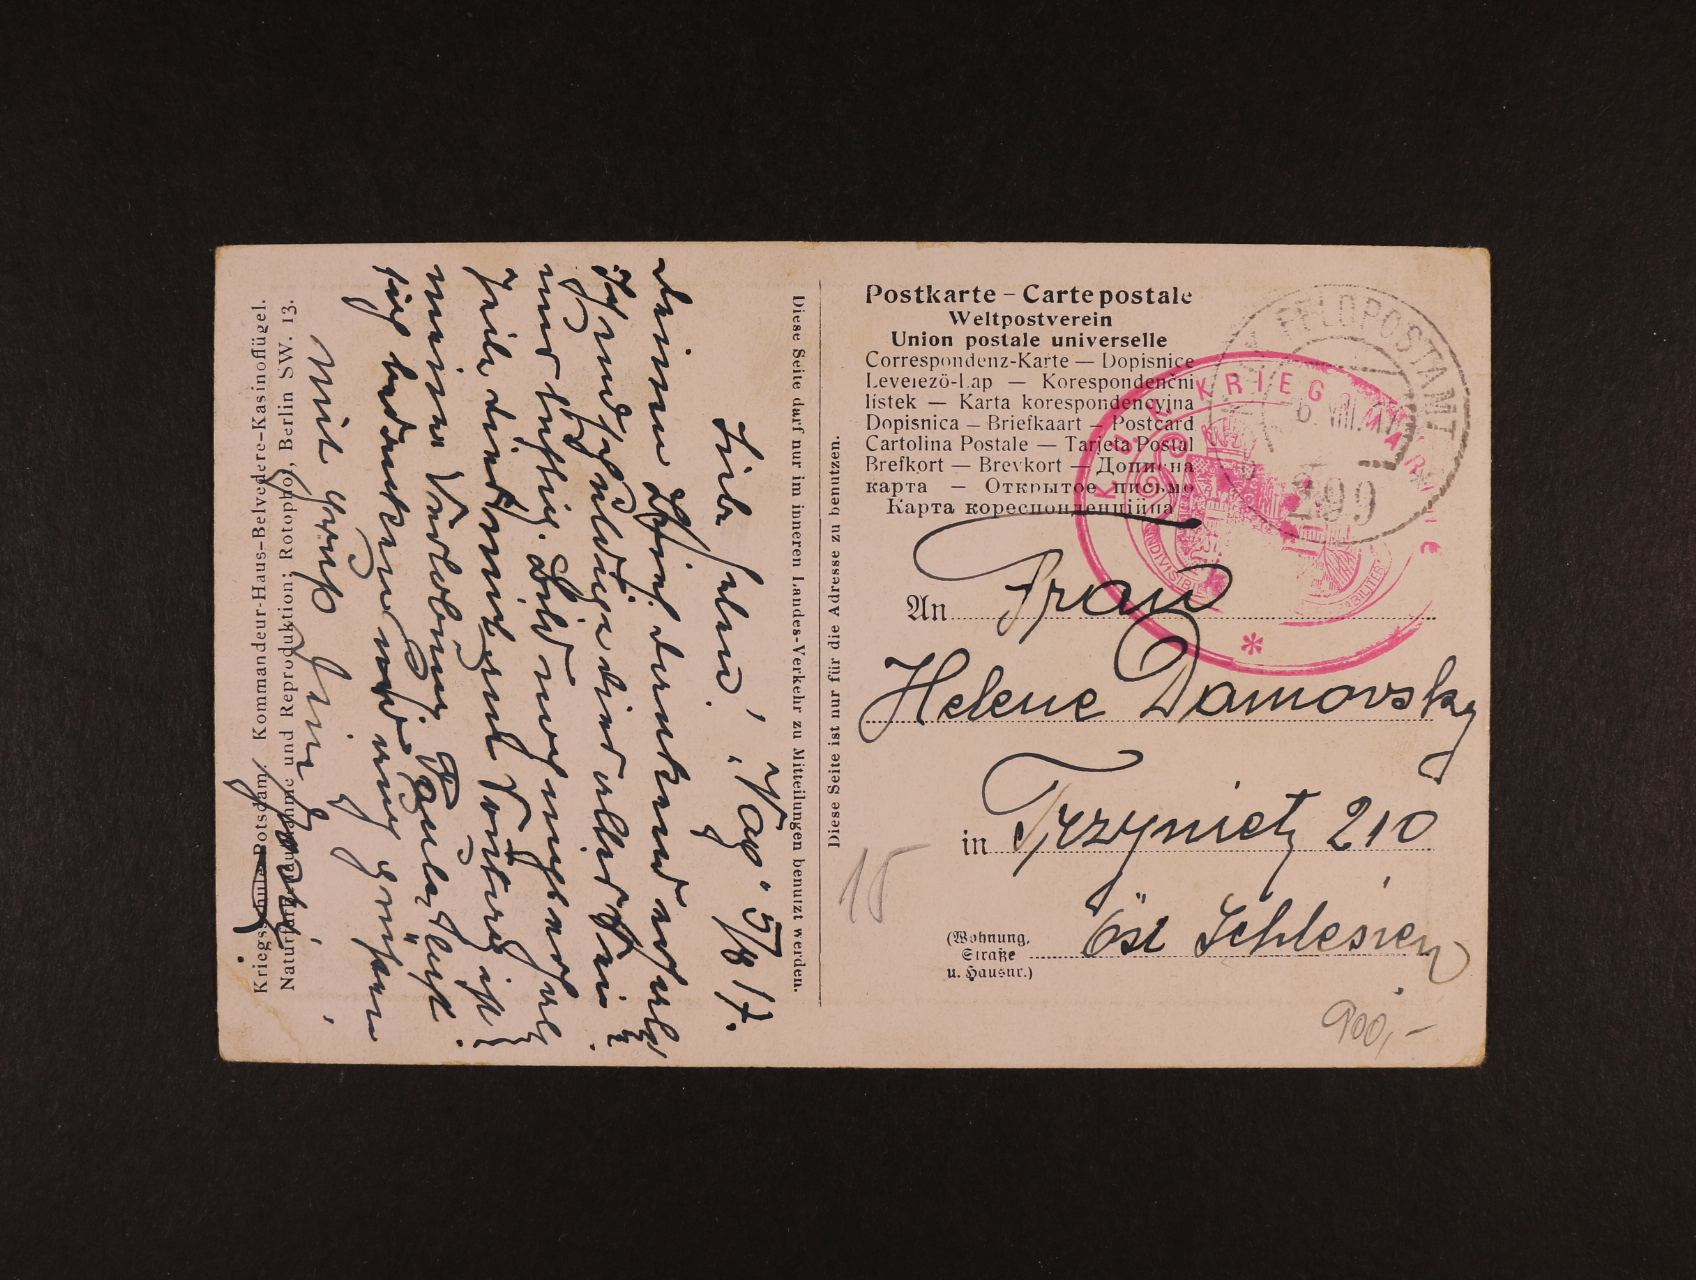 celistvost do Slezska s pod. K.u.K. FPA č. 299 6.8.1917 + oválné červené útvar. raz. K.u.K. KRIEGSMARINE